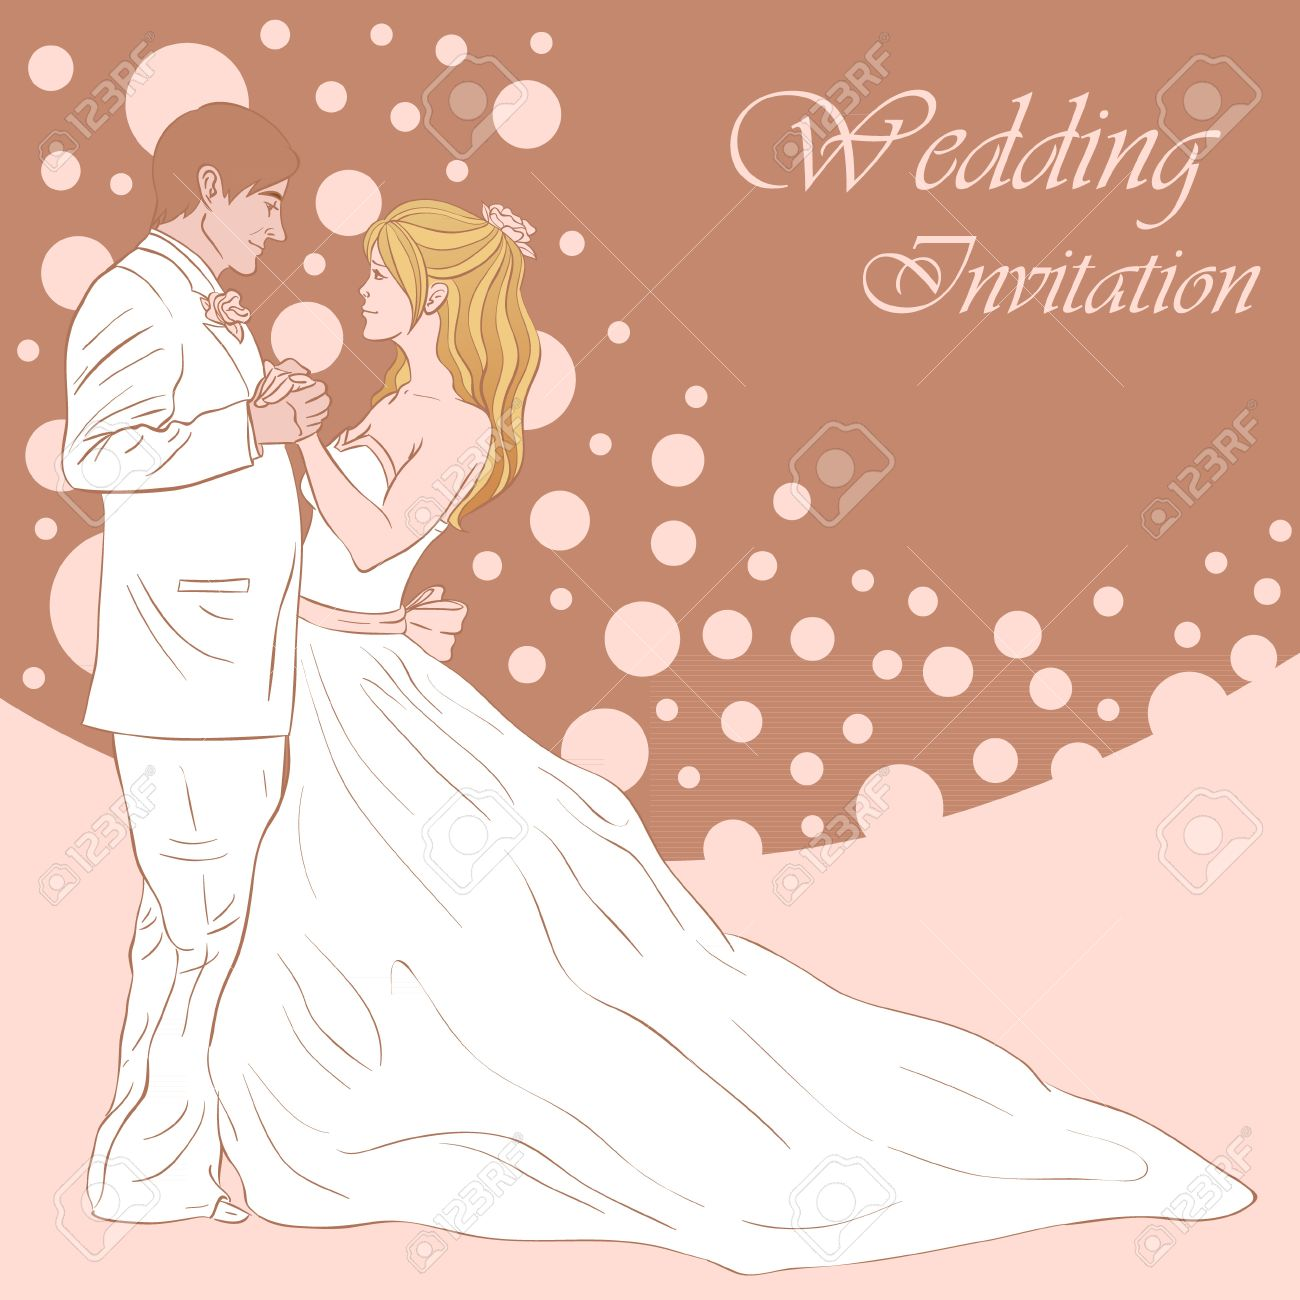 Bride and groom wedding invitation card on a lovely floral bride and groom wedding invitation card on a lovely floral background stopboris Gallery